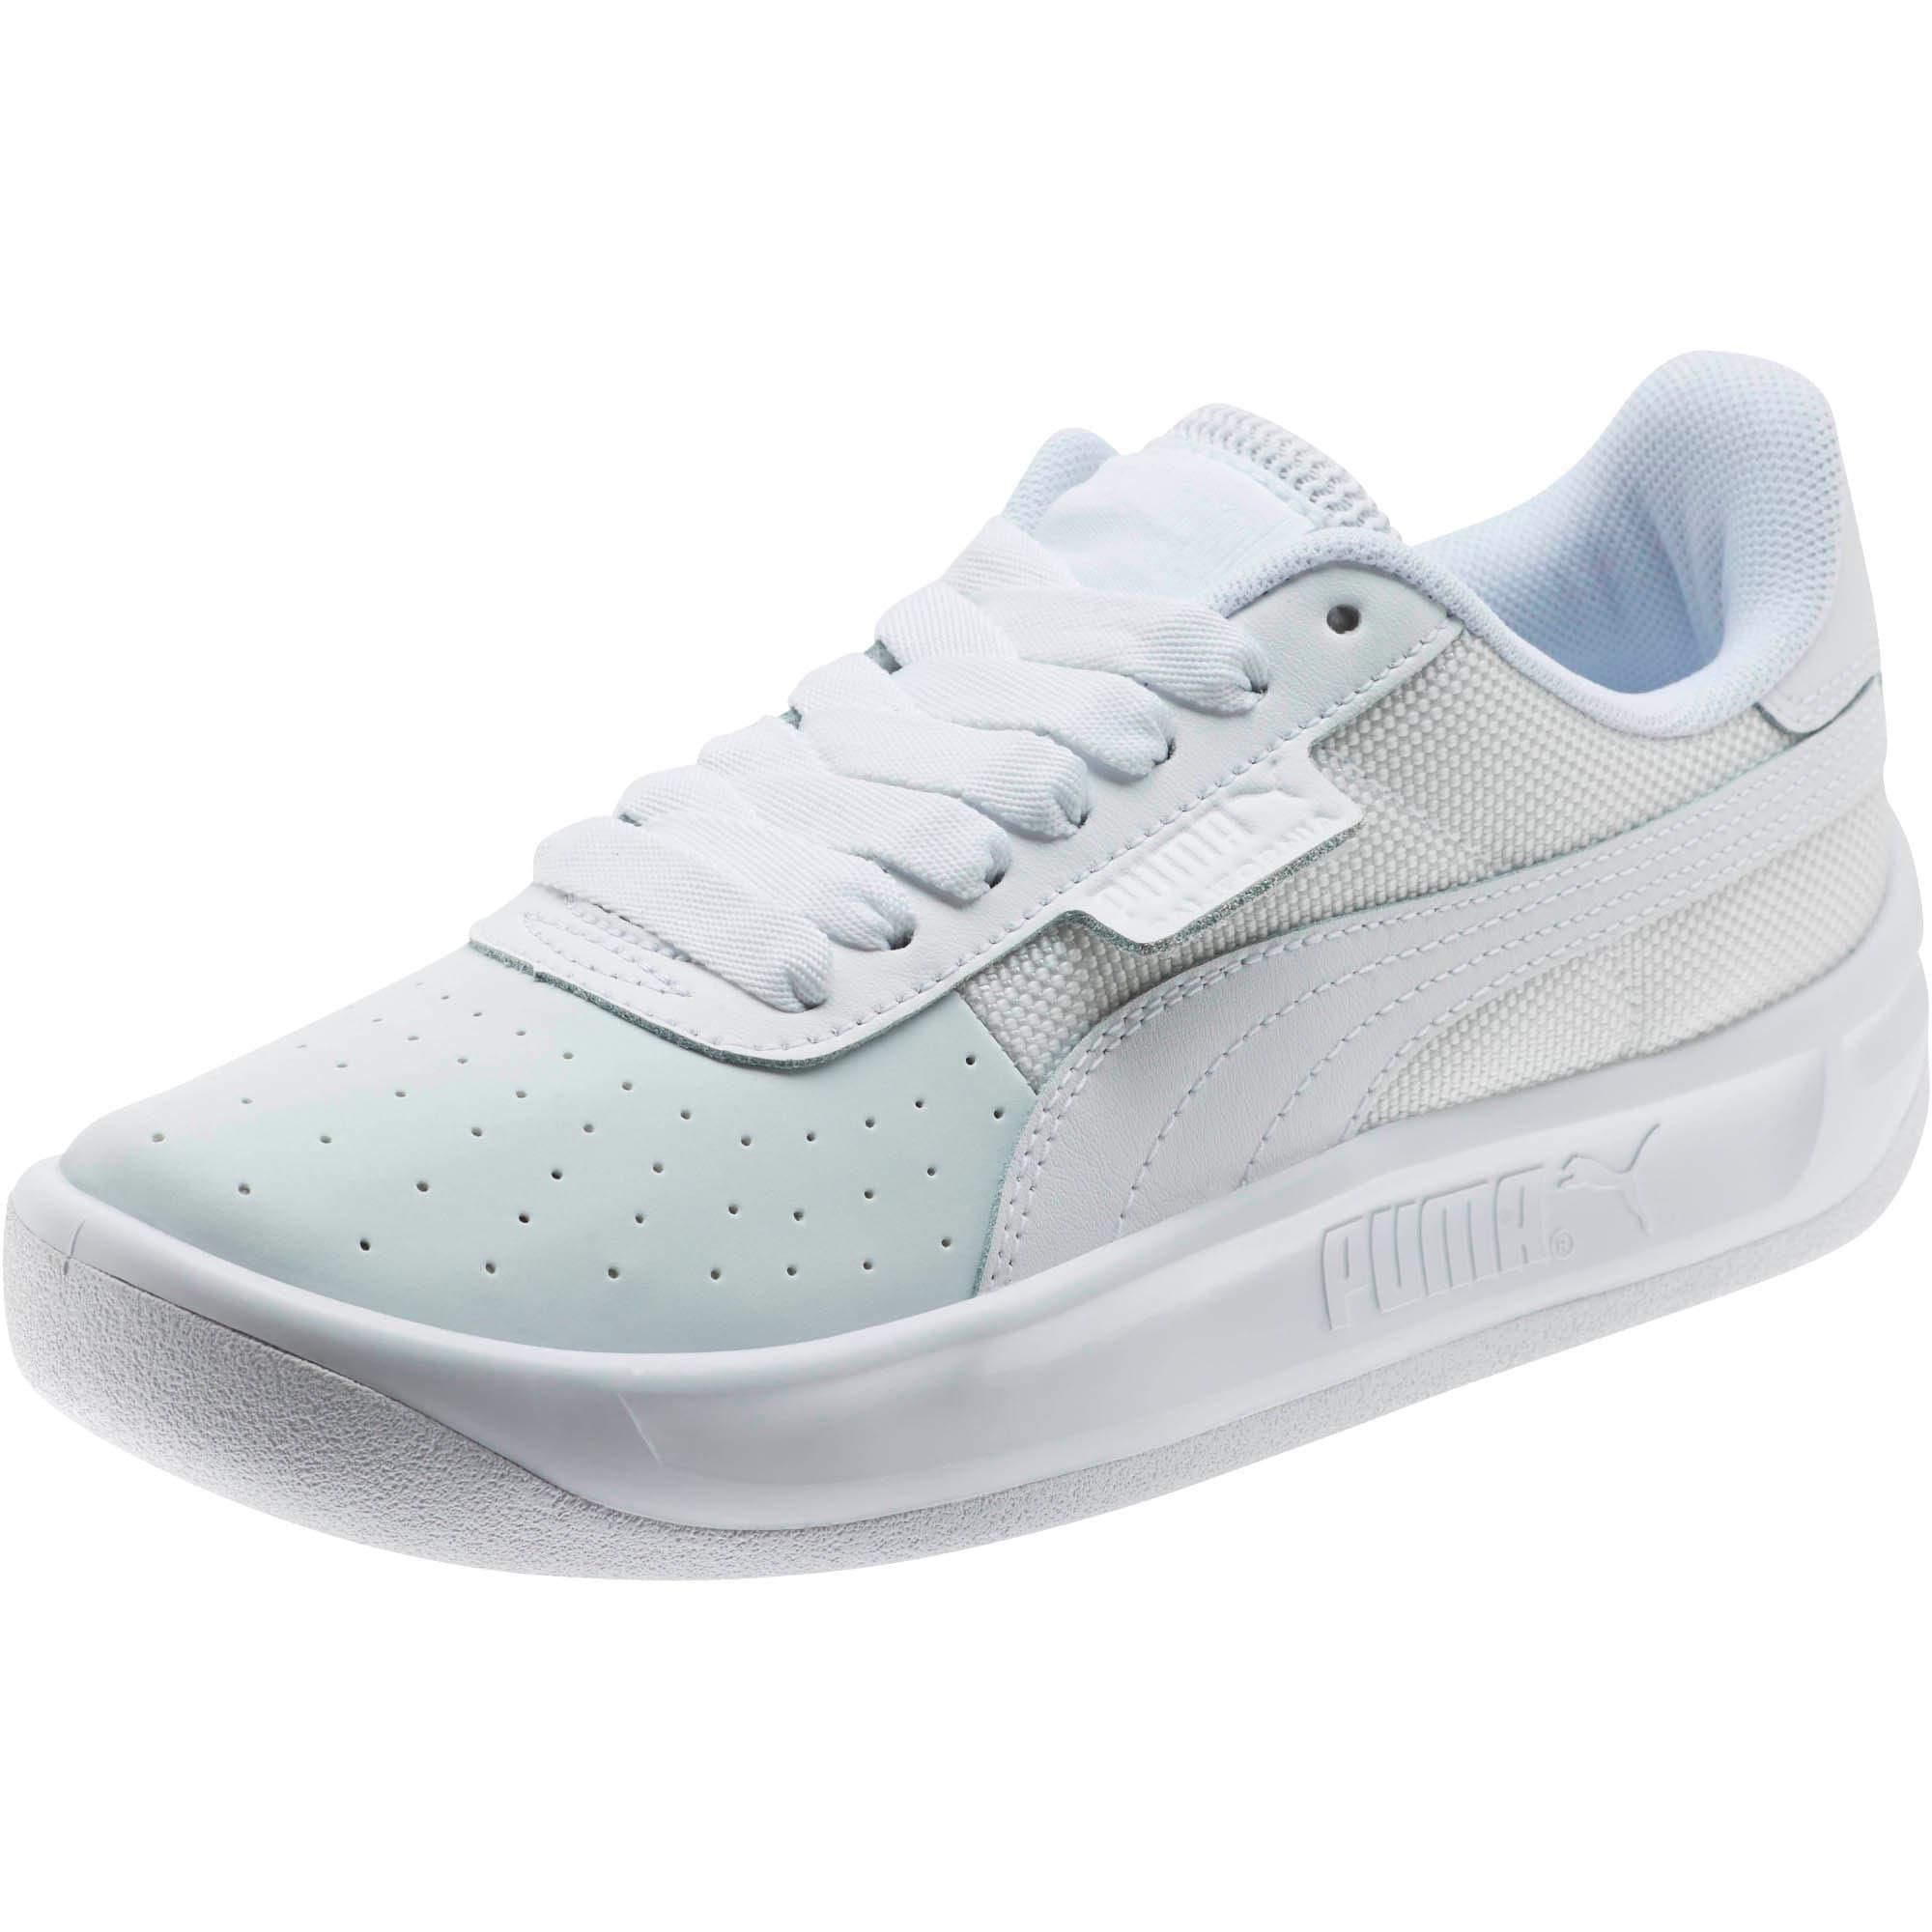 Thumbnail 1 of California Sneakers JR, P White-P White-P White, medium